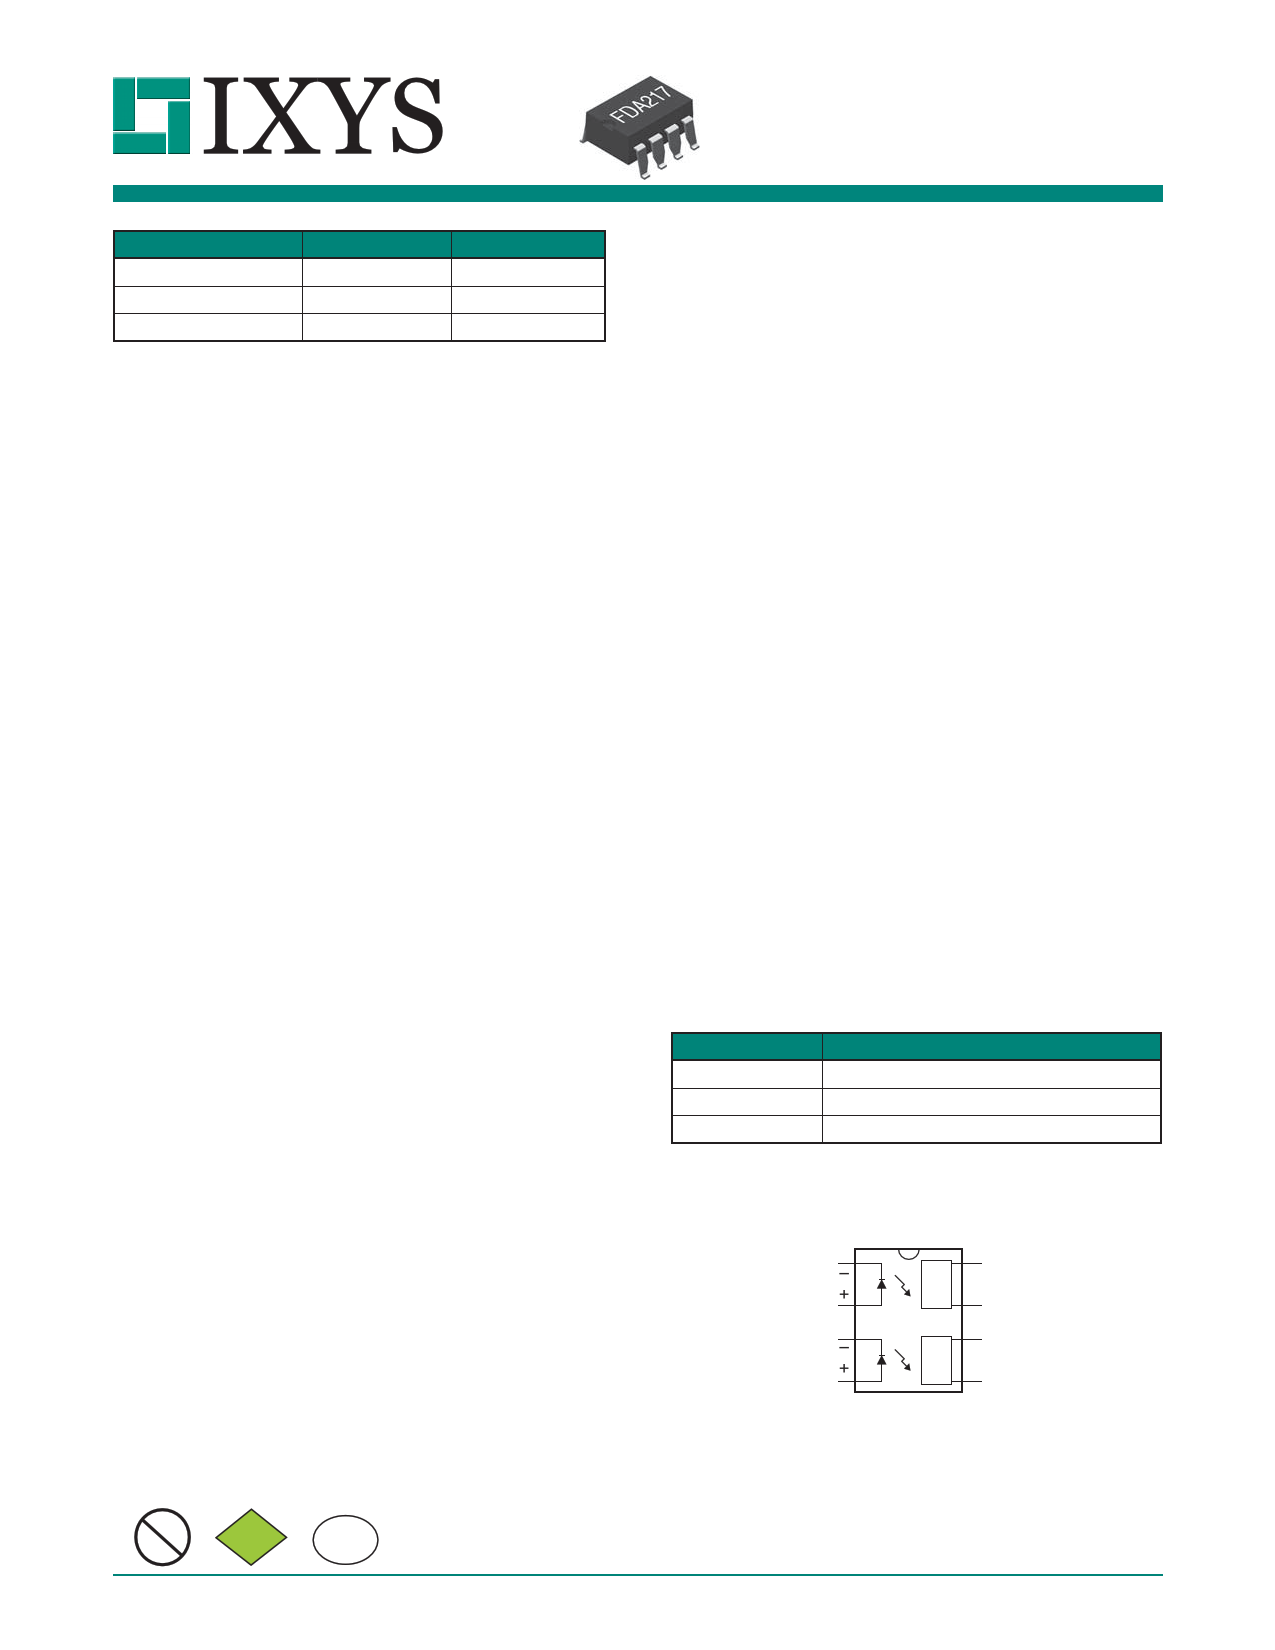 fda217 datasheet pdf   pinout